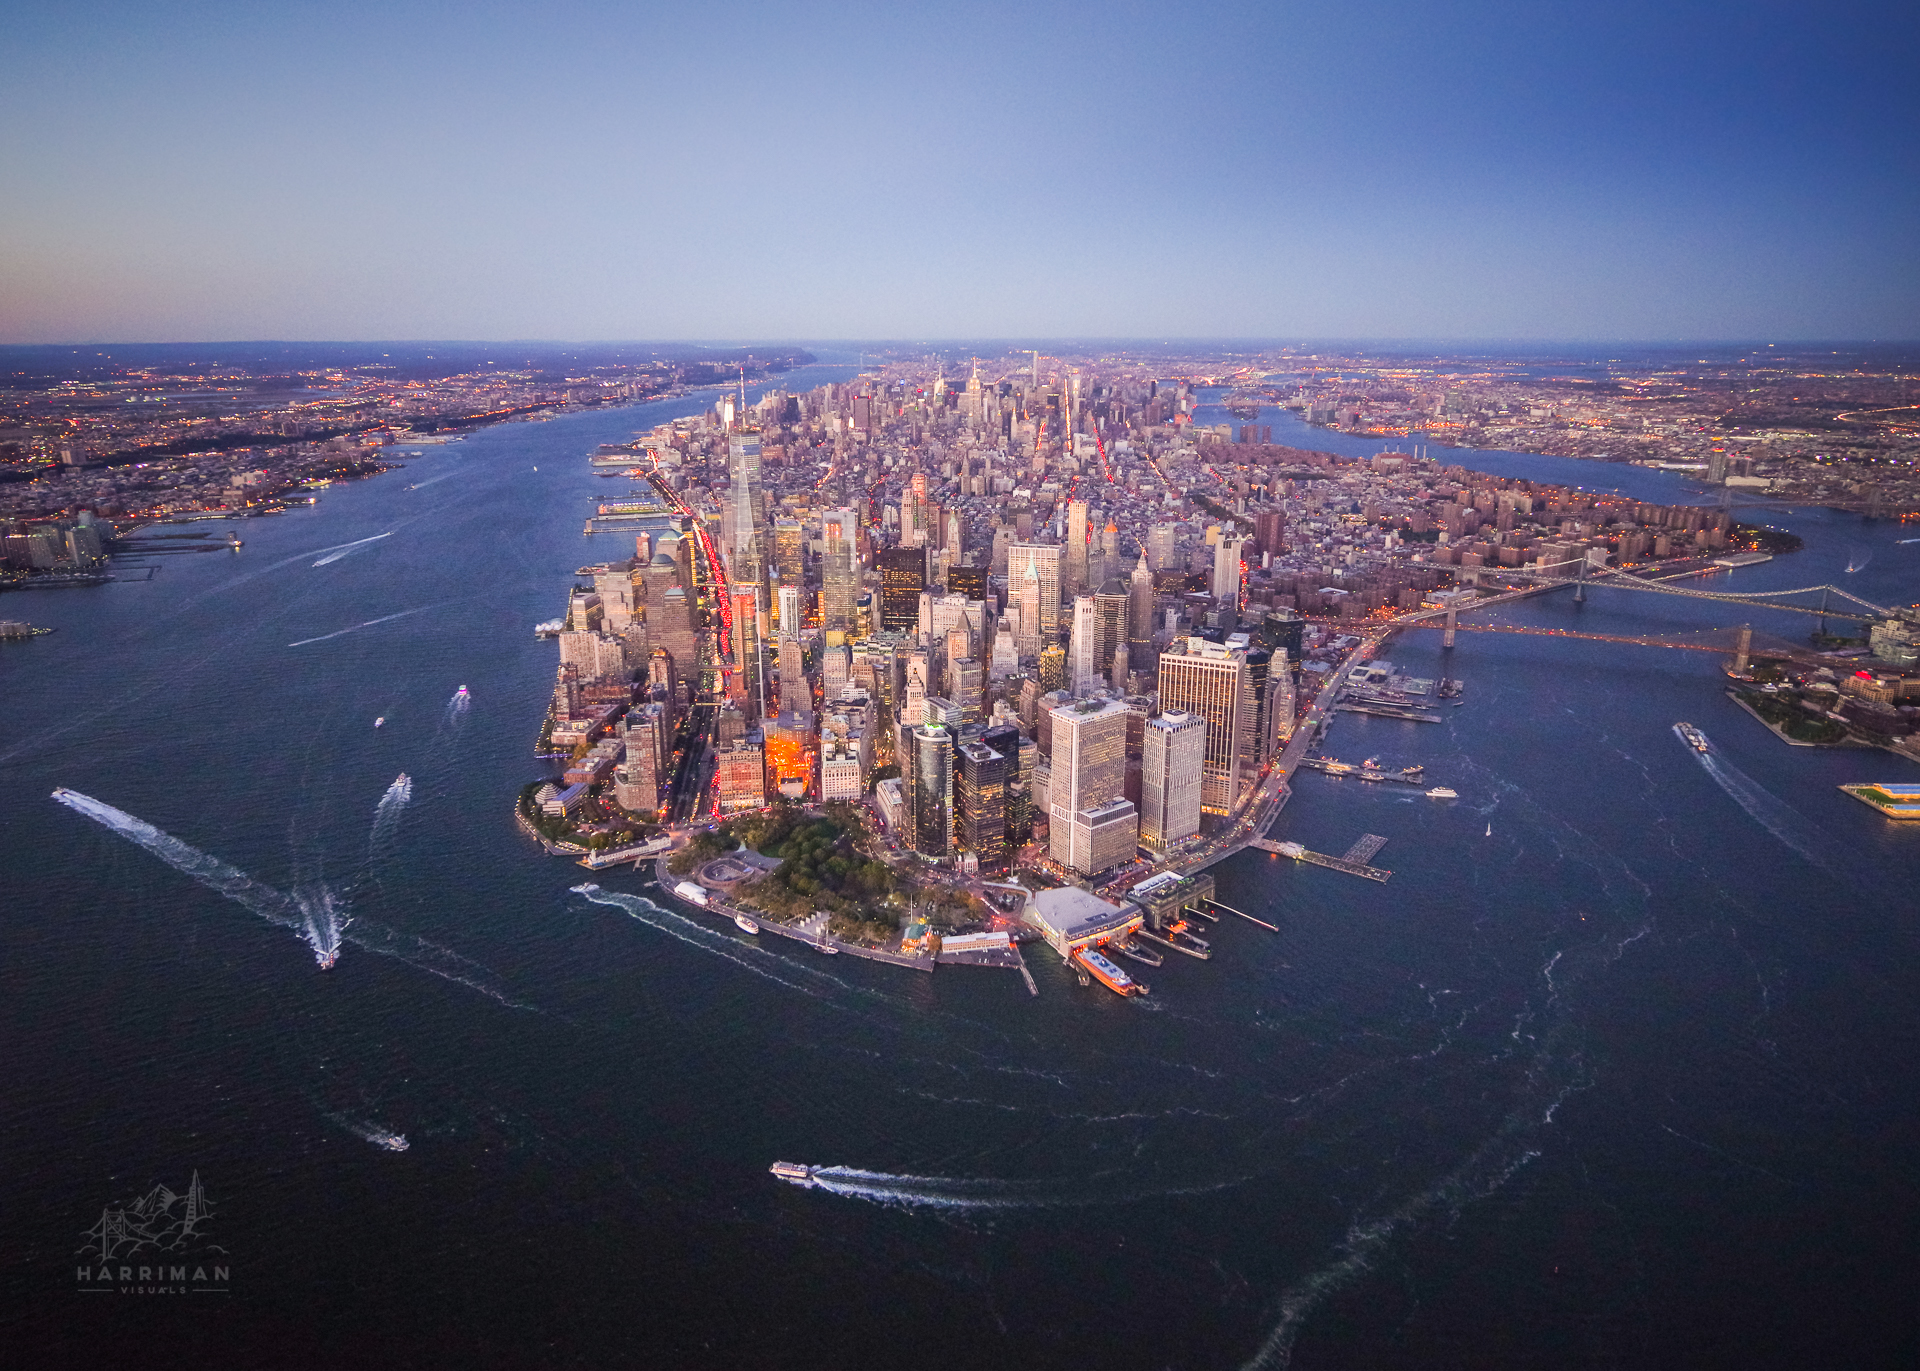 Above New York City